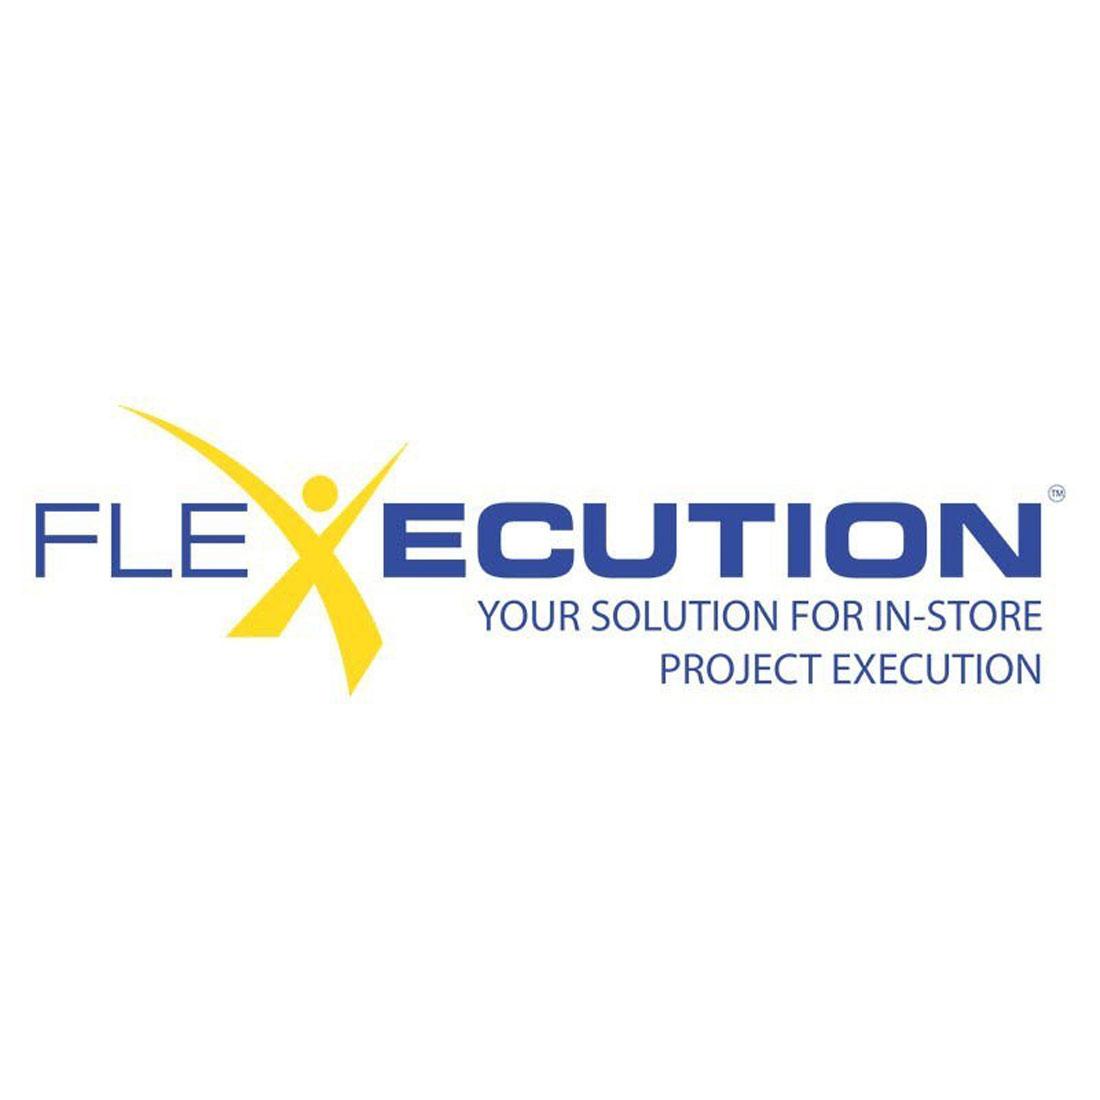 Flexecution